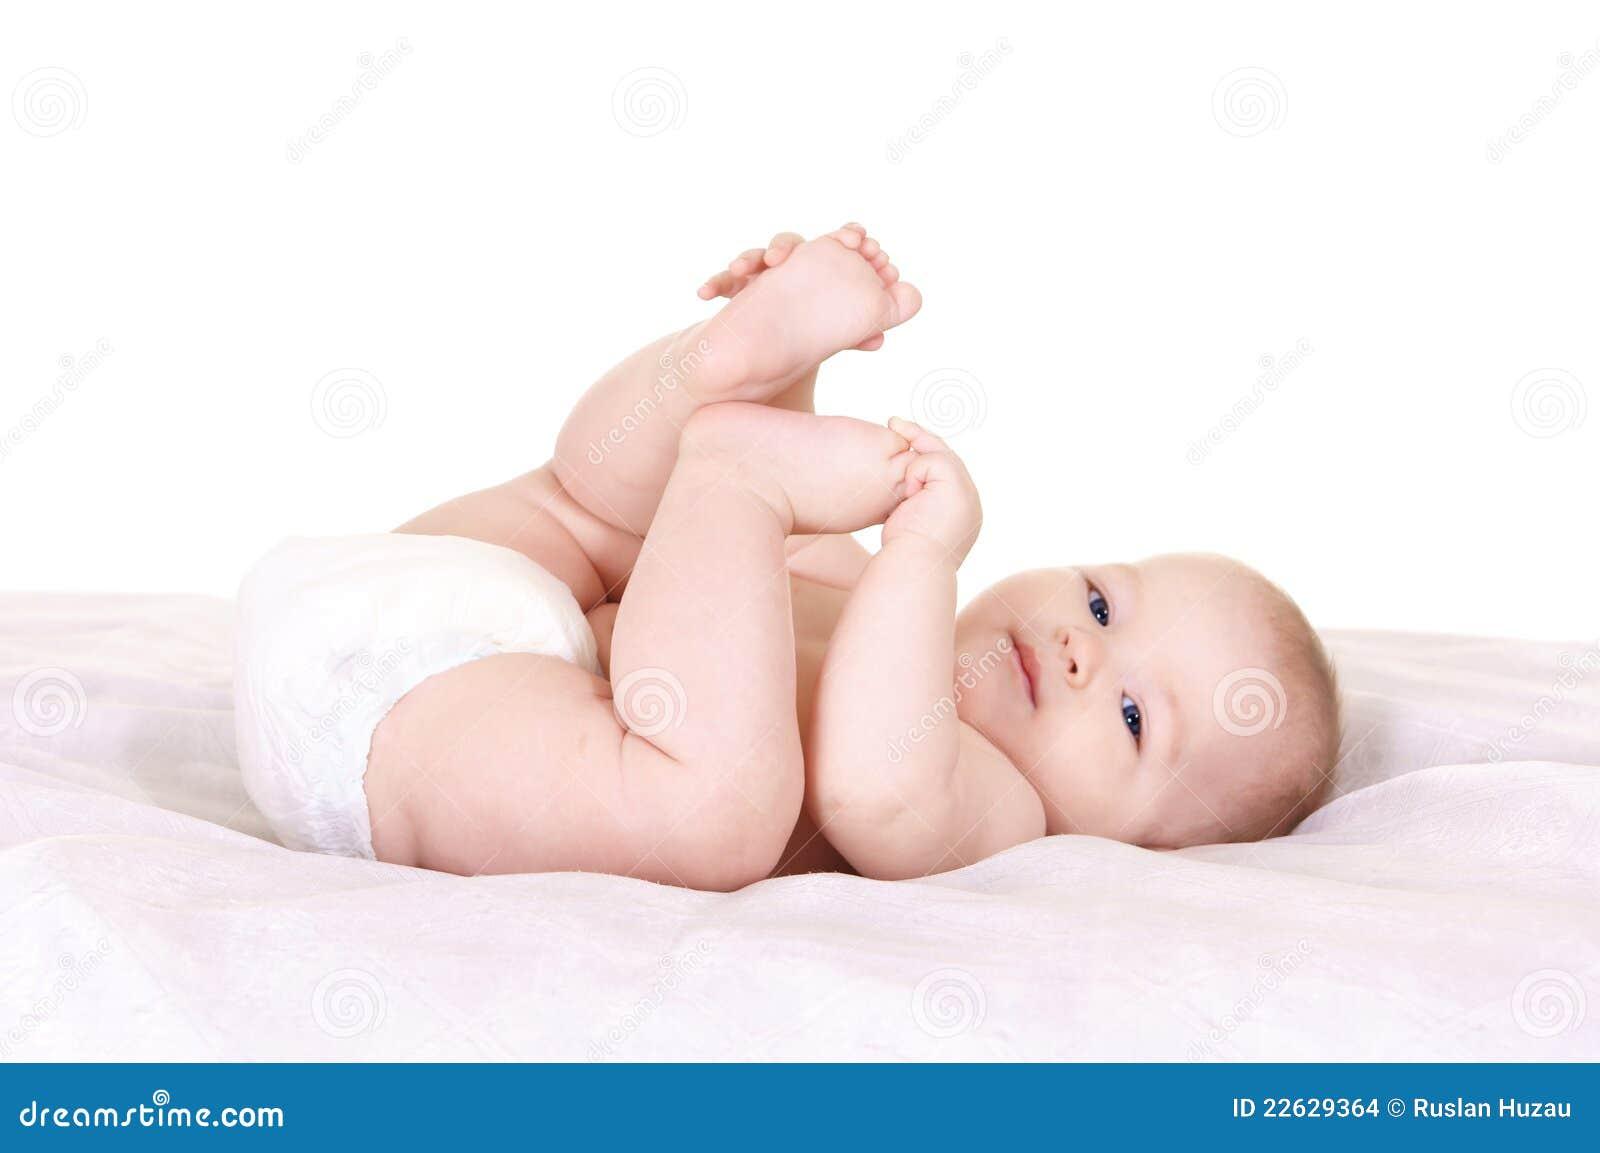 Genial Baby At Bed